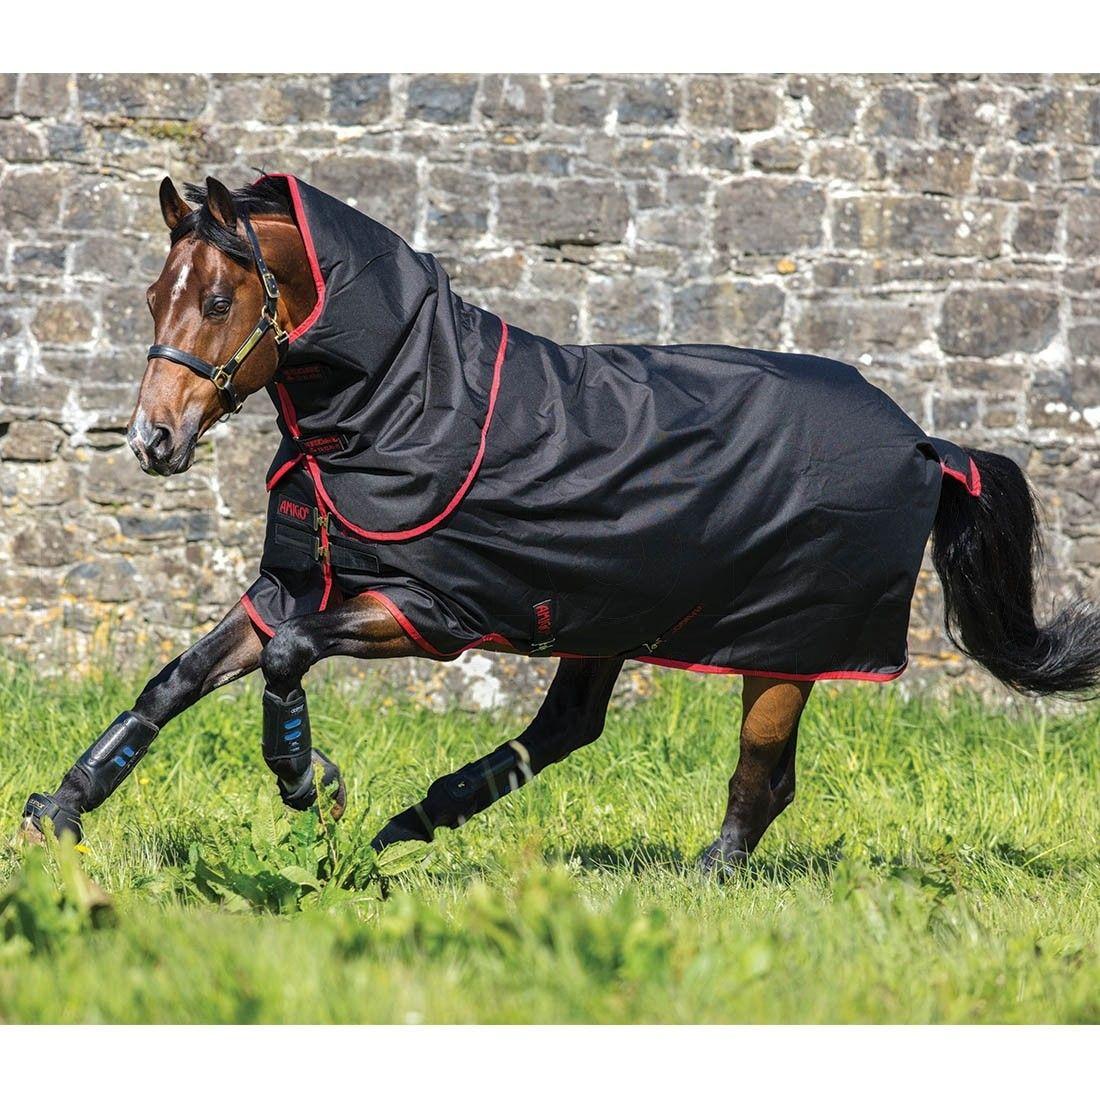 Horseware Amigo Super Hero 12 1200d